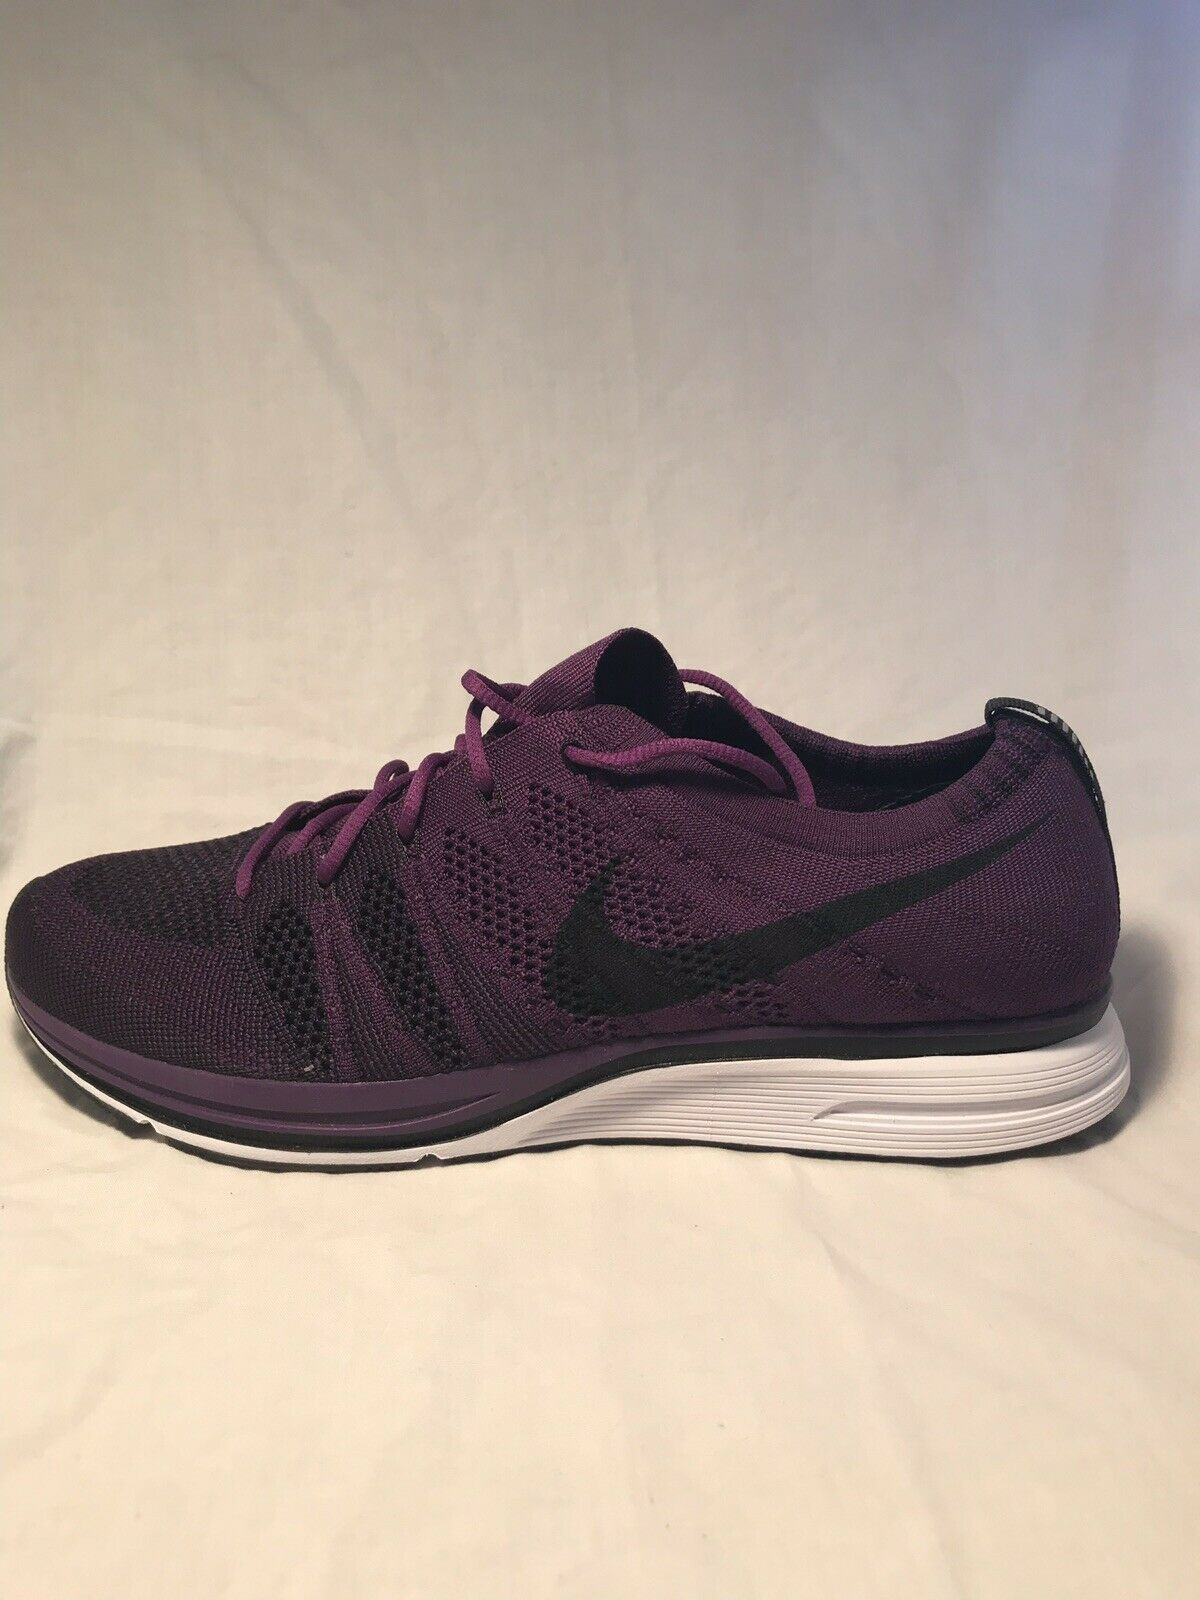 Mens Nike Flyknit Trainer AH8396-500 Night Purple Brand New Size 10.5